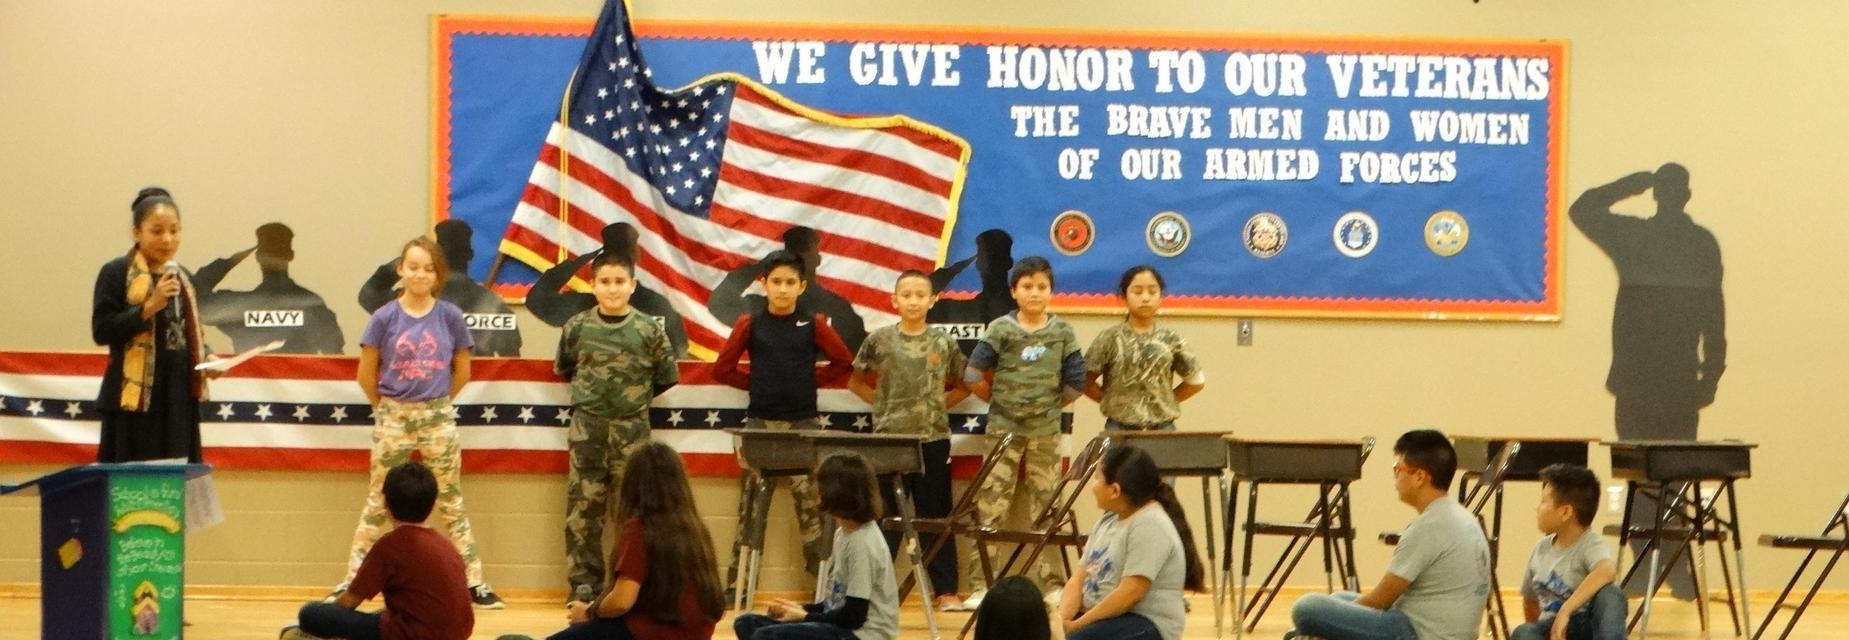 5th grade skit at the Veterans Day Program